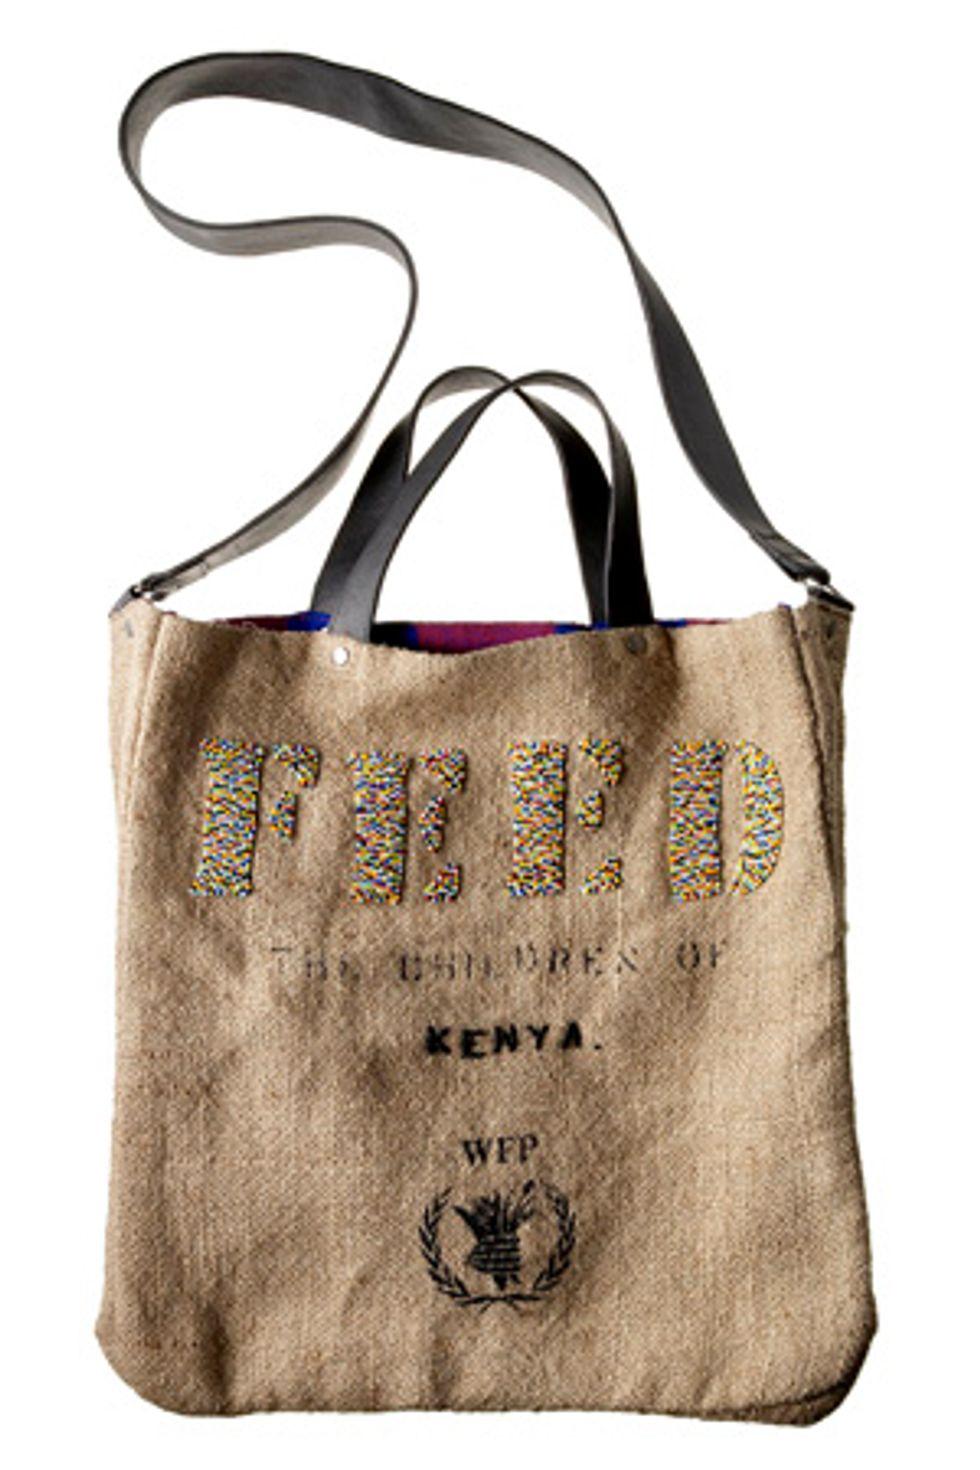 Fashionably Conscious: FEED 2 Kenya Bag